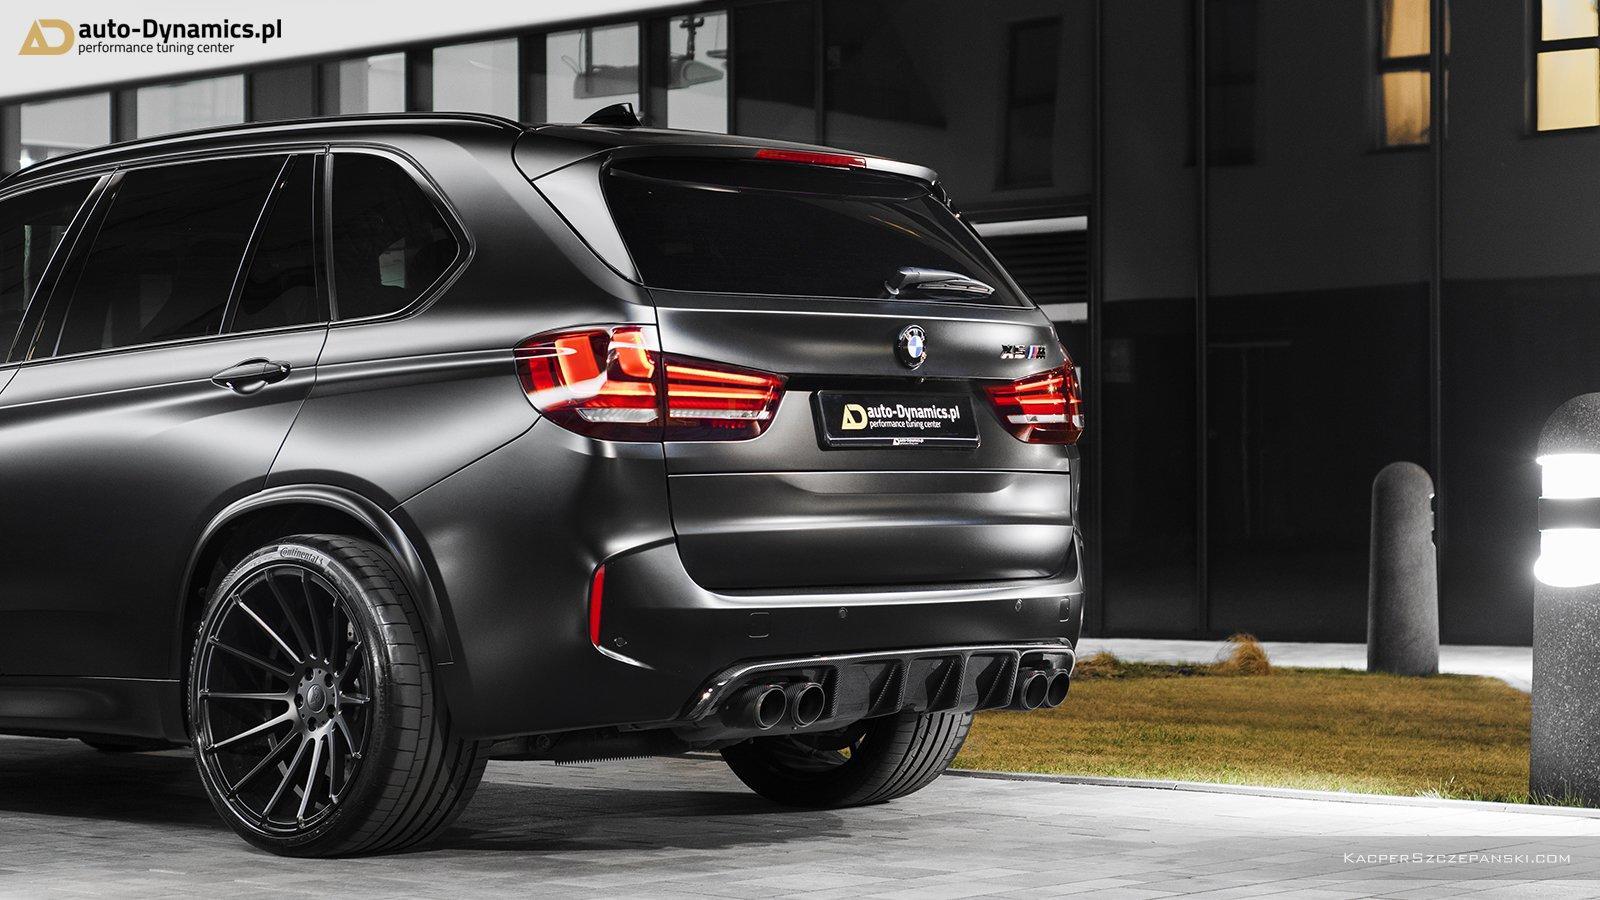 BMW X5 M by Auto-Dynamics - BMW X5 M by Auto-Dynamics